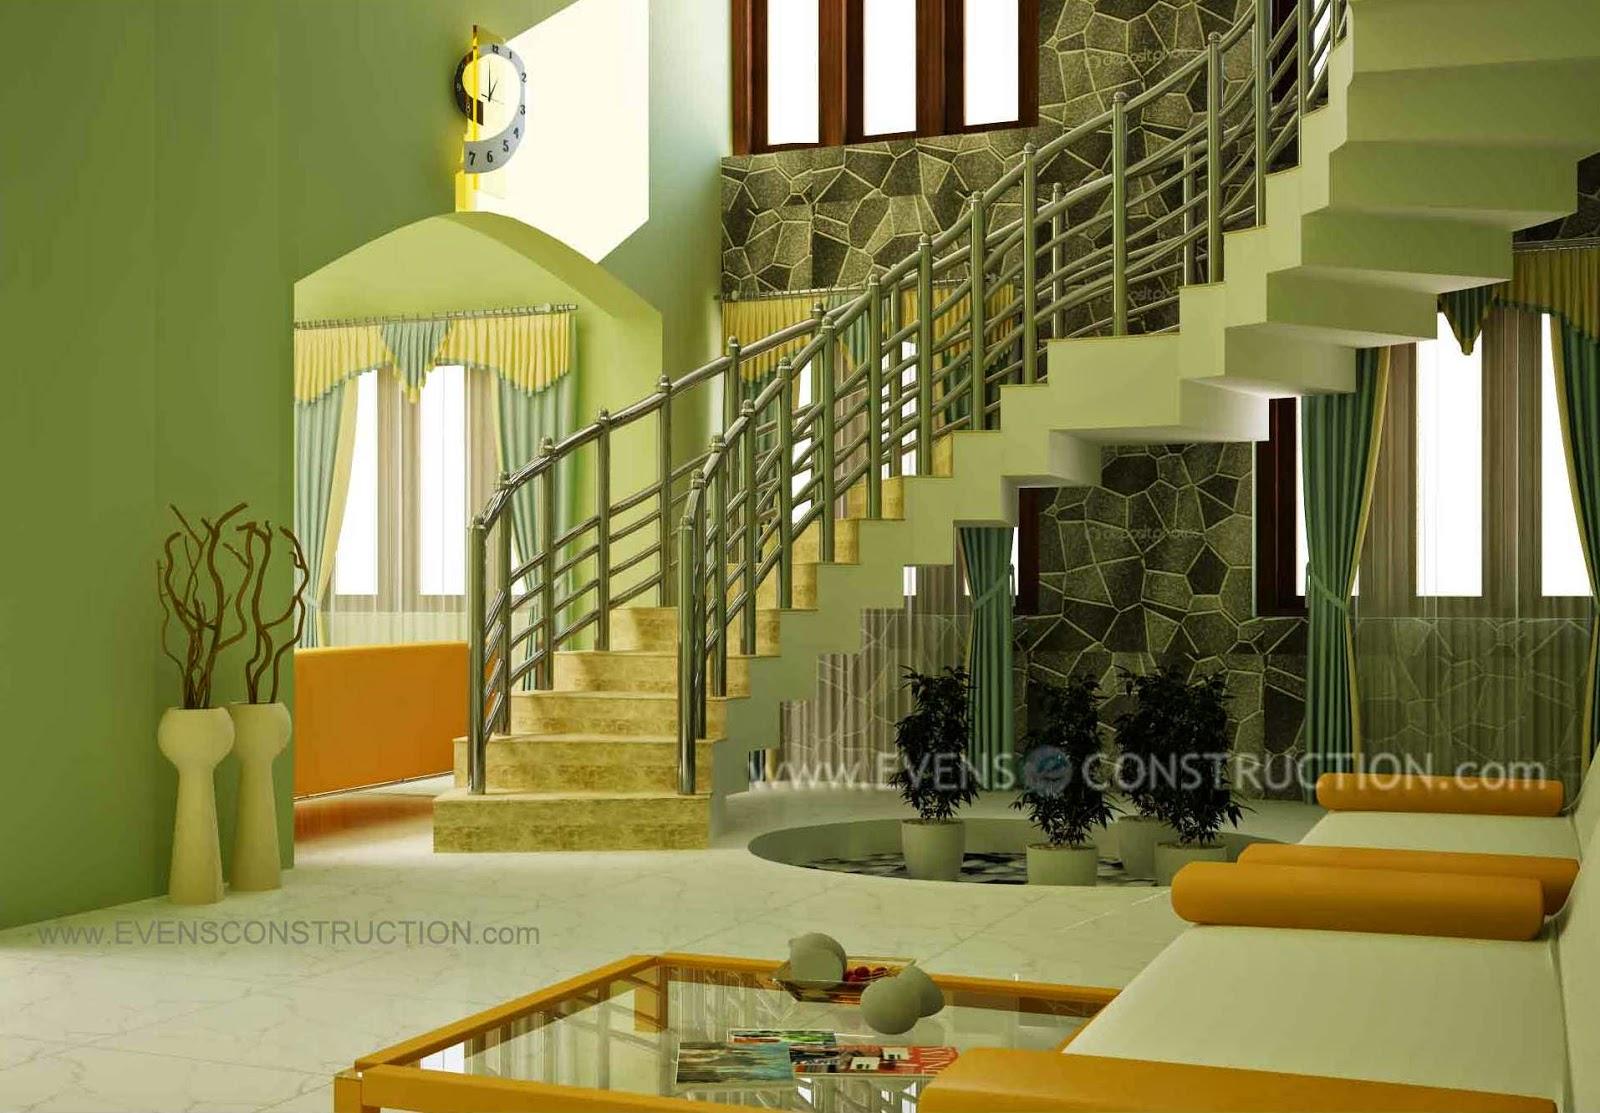 Evens Construction Pvt Ltd Staircase Design For Modern